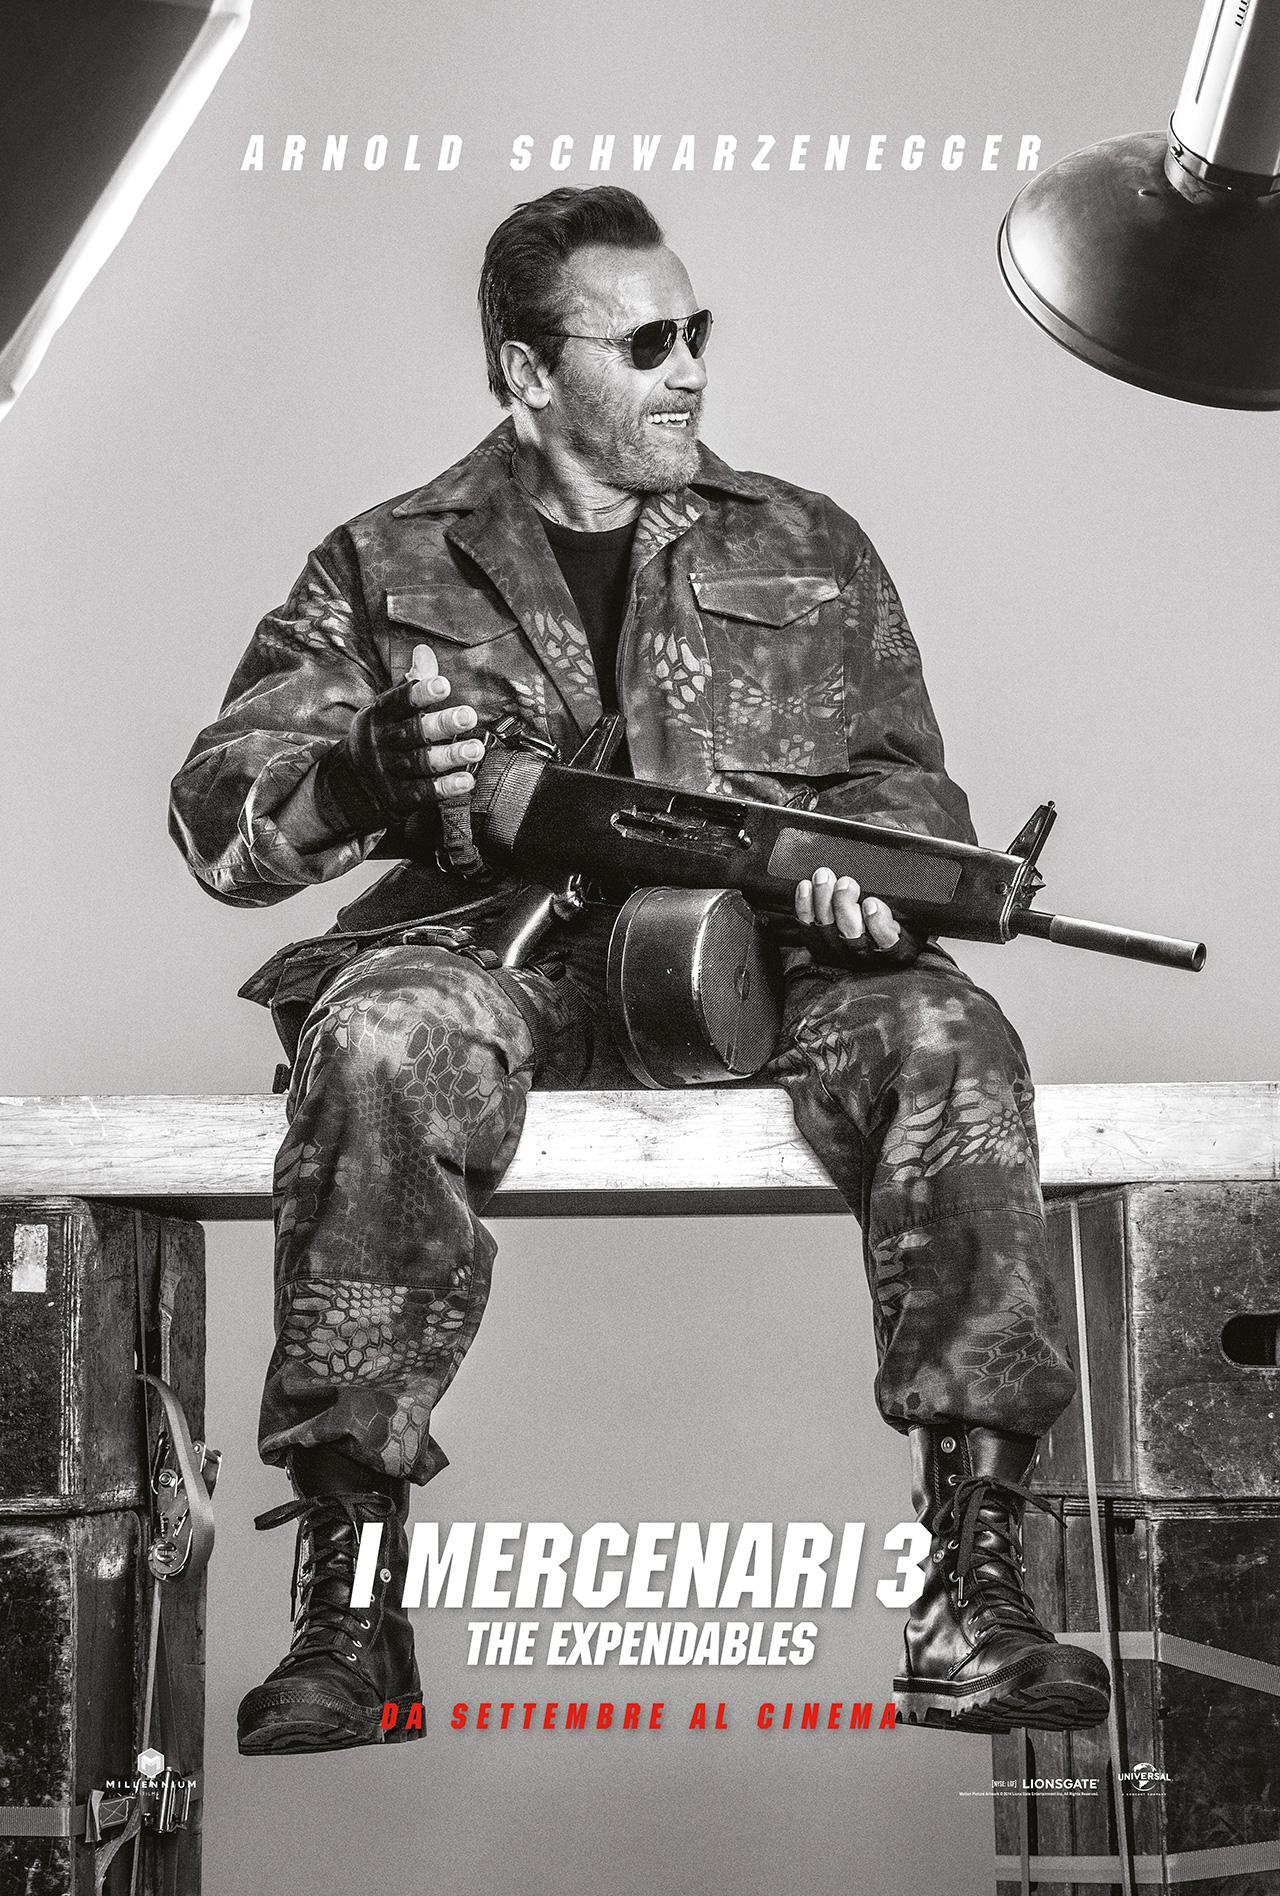 I Mercenari 3 - The Expendables: il character poster di Arnold Schwarzenegger